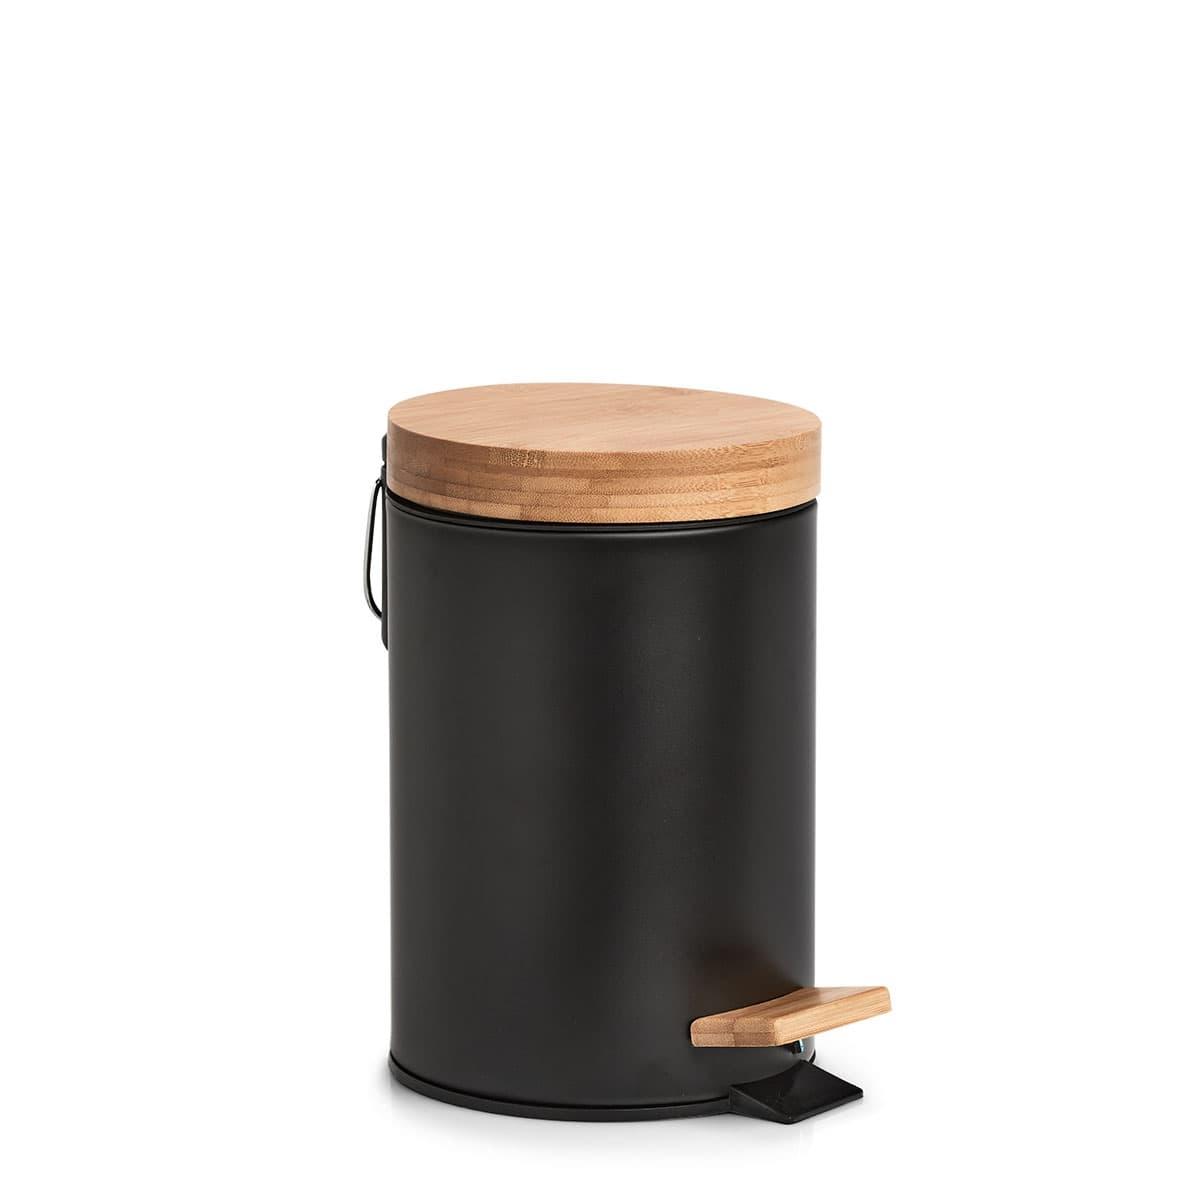 Cos de gunoi cu pedala pentru baie, din metal si bambus, Shade II Negru, Ø16,8xH24 cm imagine